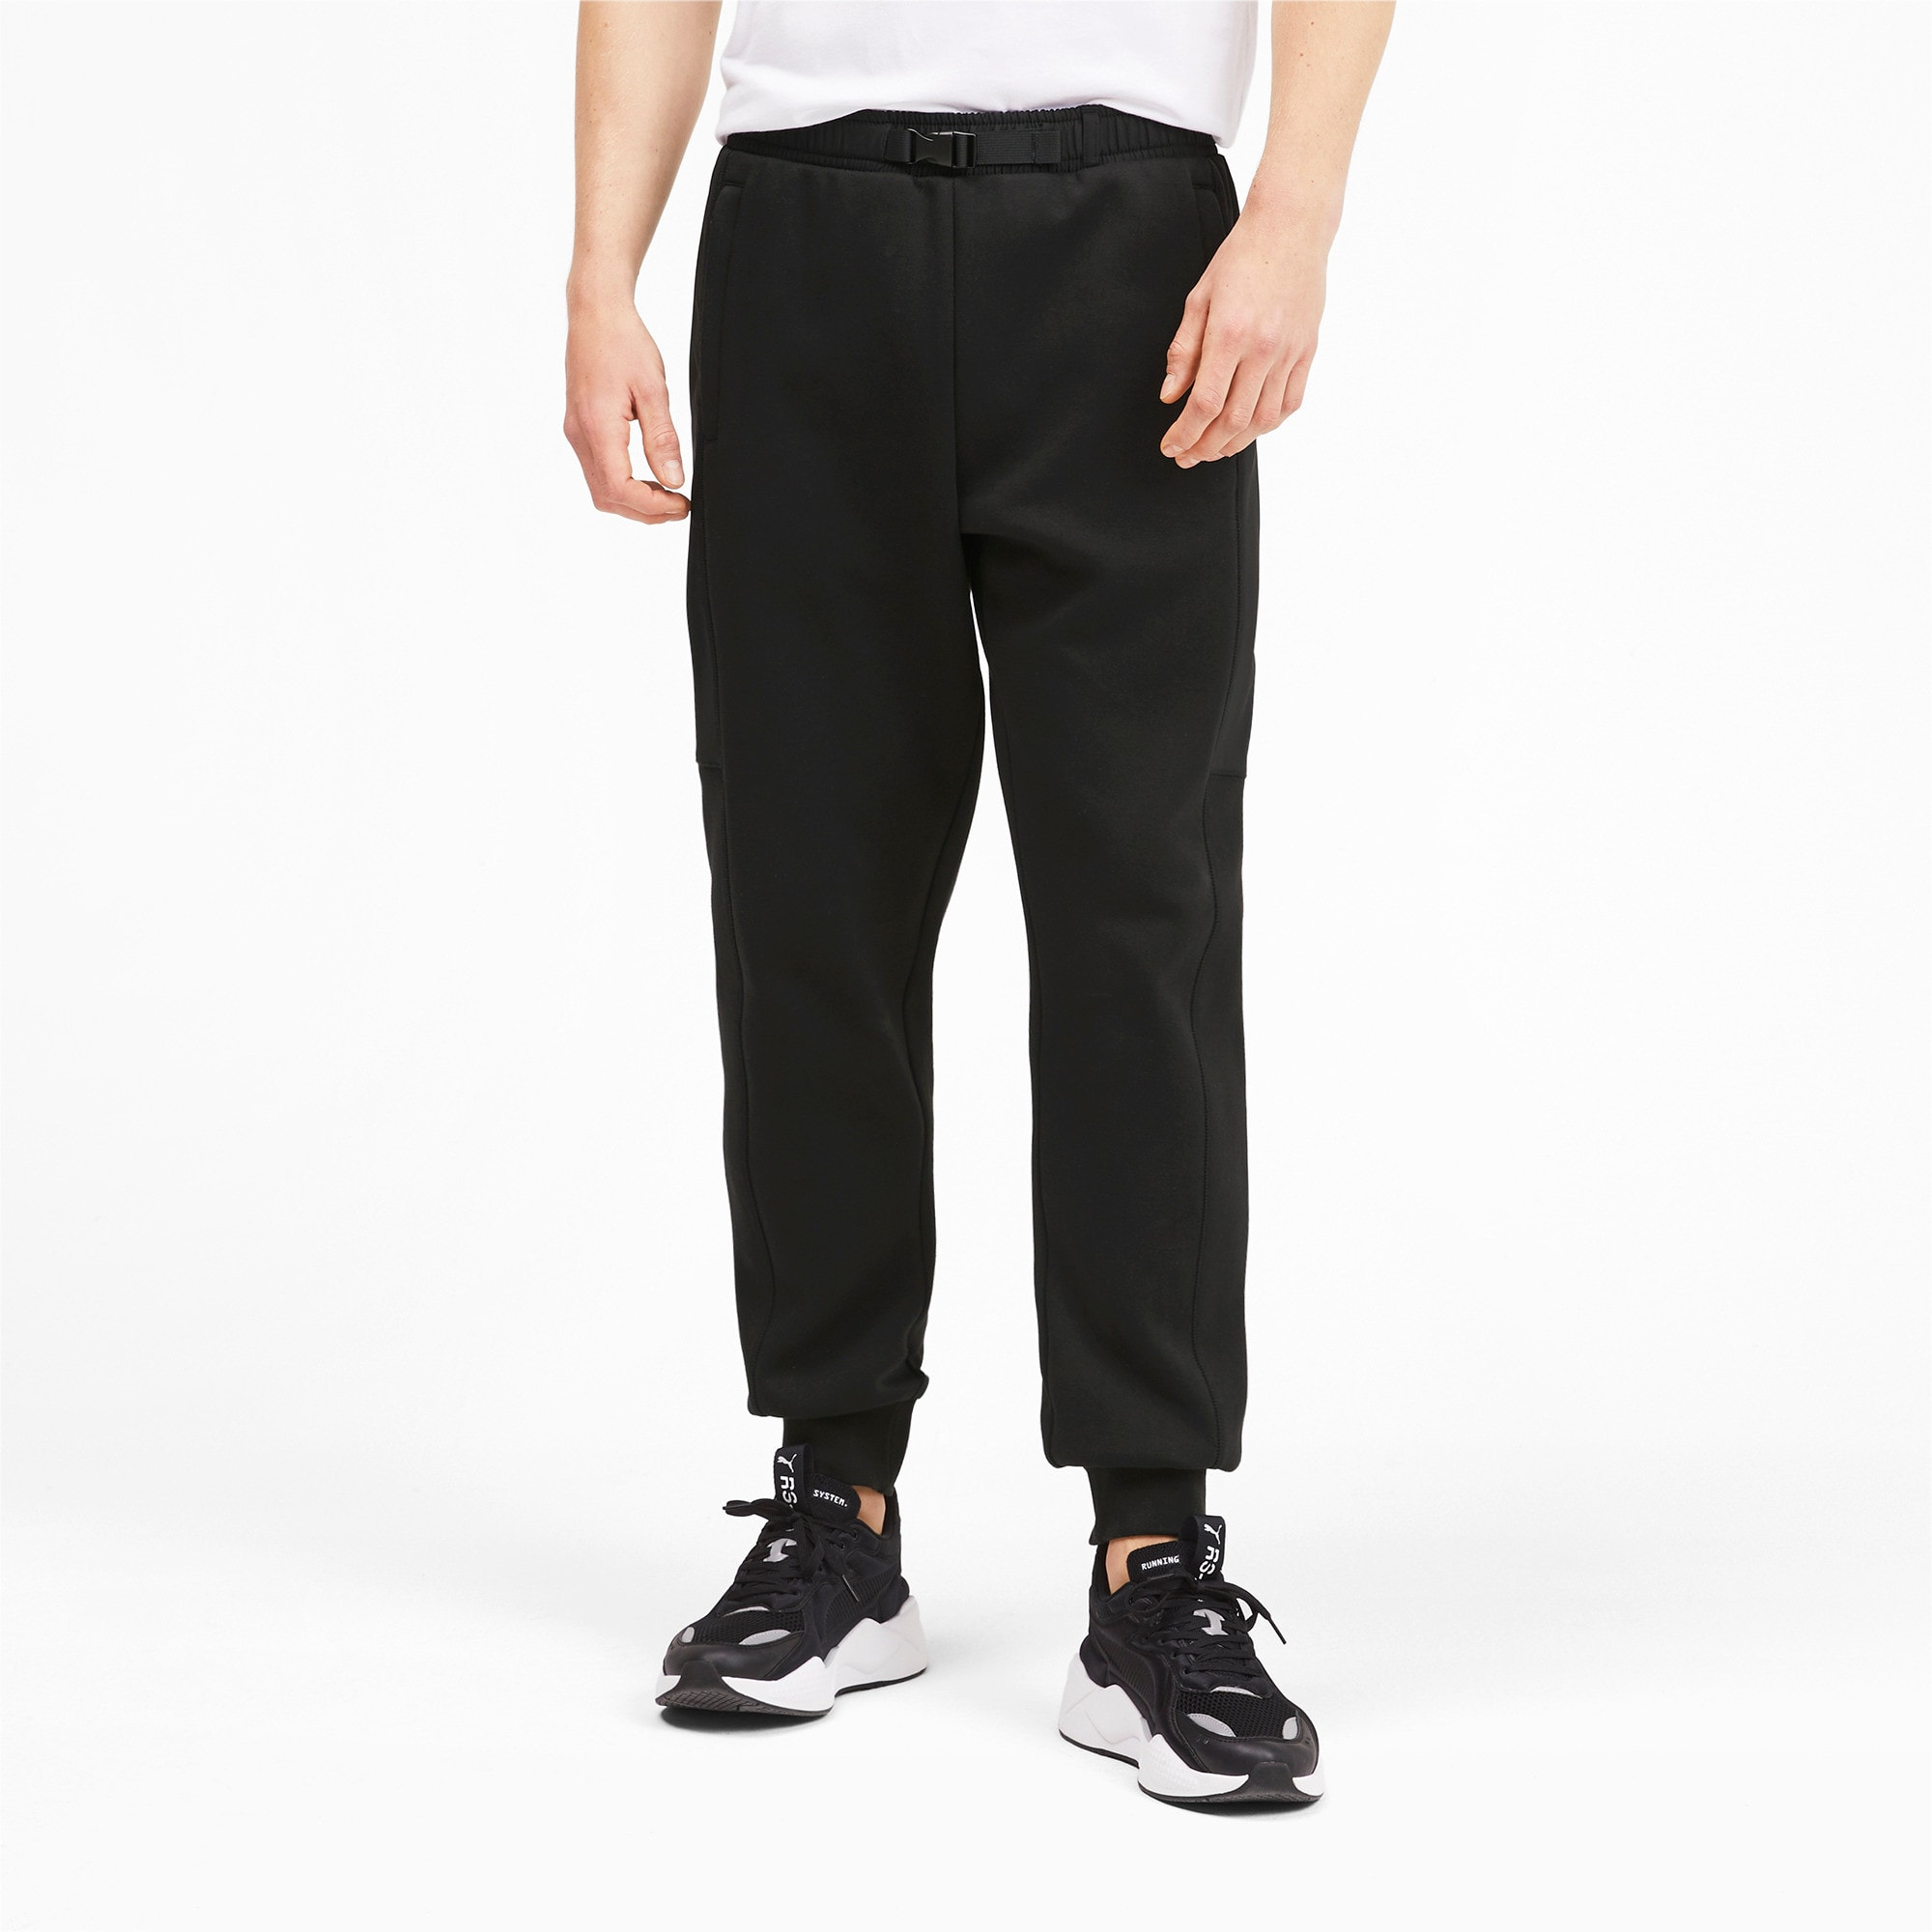 Miniatura 2 de Pantalones deportivos Epoch Hybrid para hombre, Puma Black, mediano